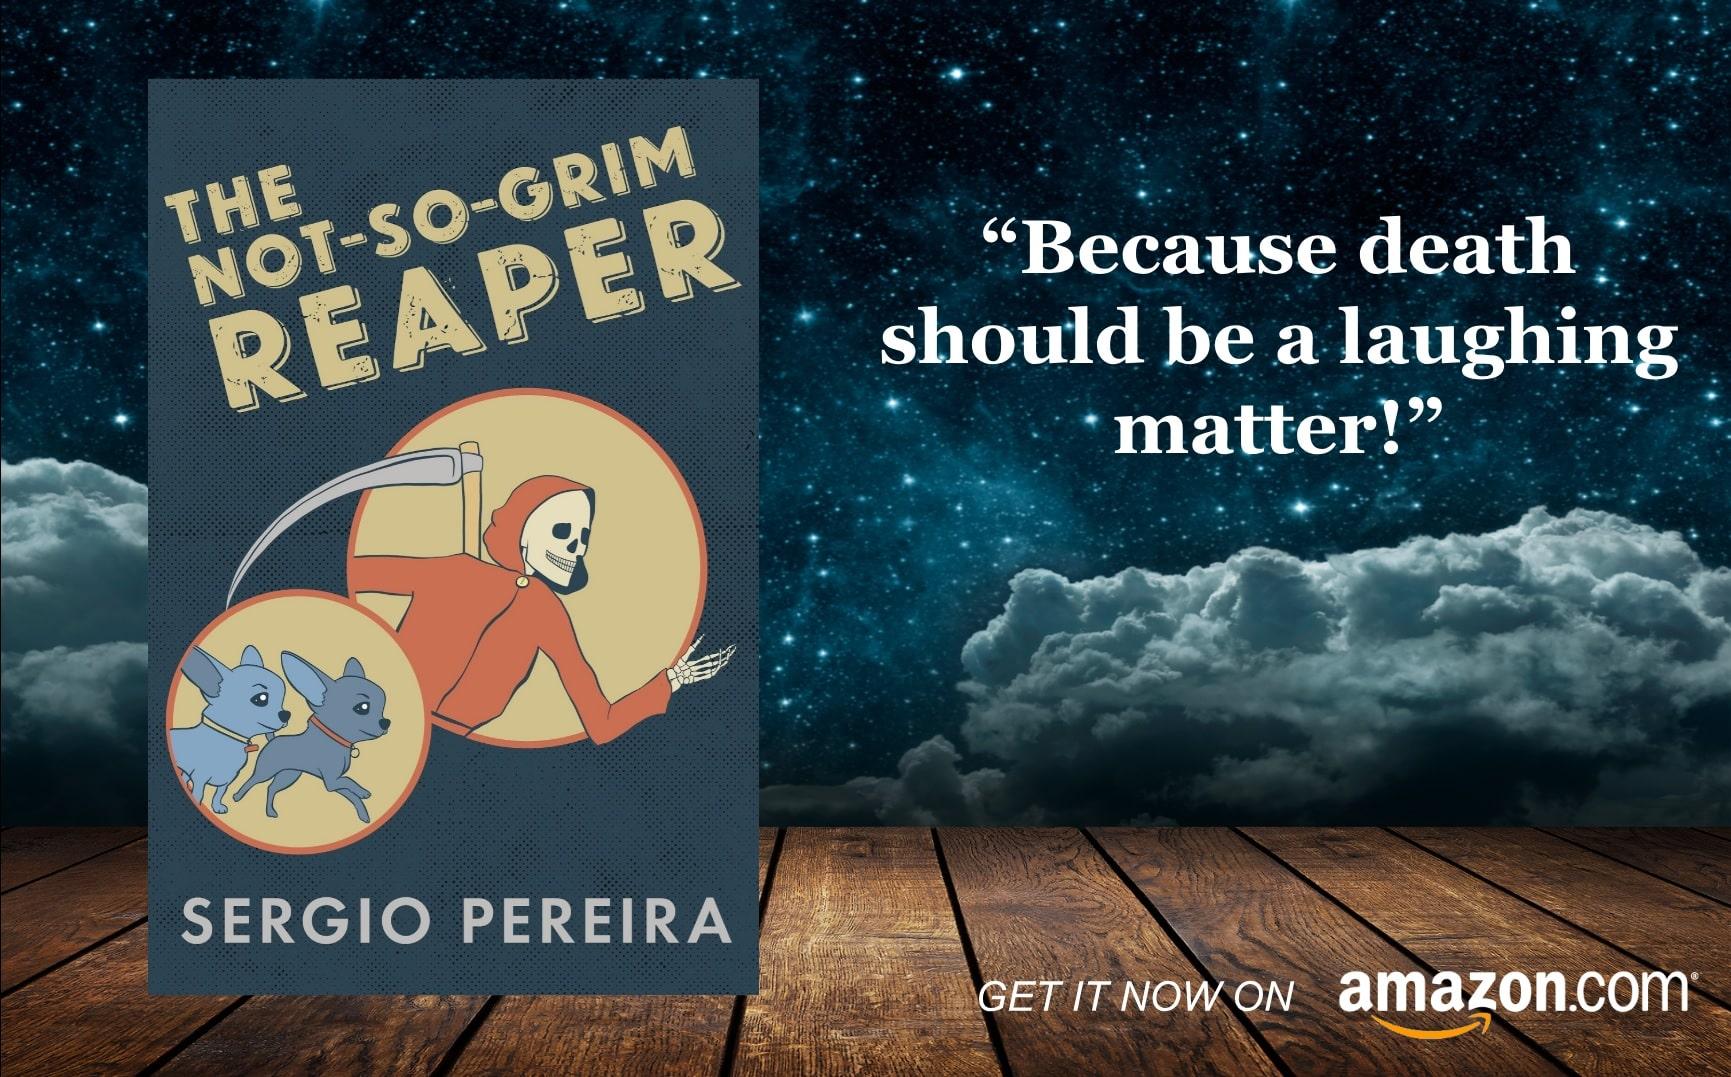 The Not-So-Grim Reaper promo